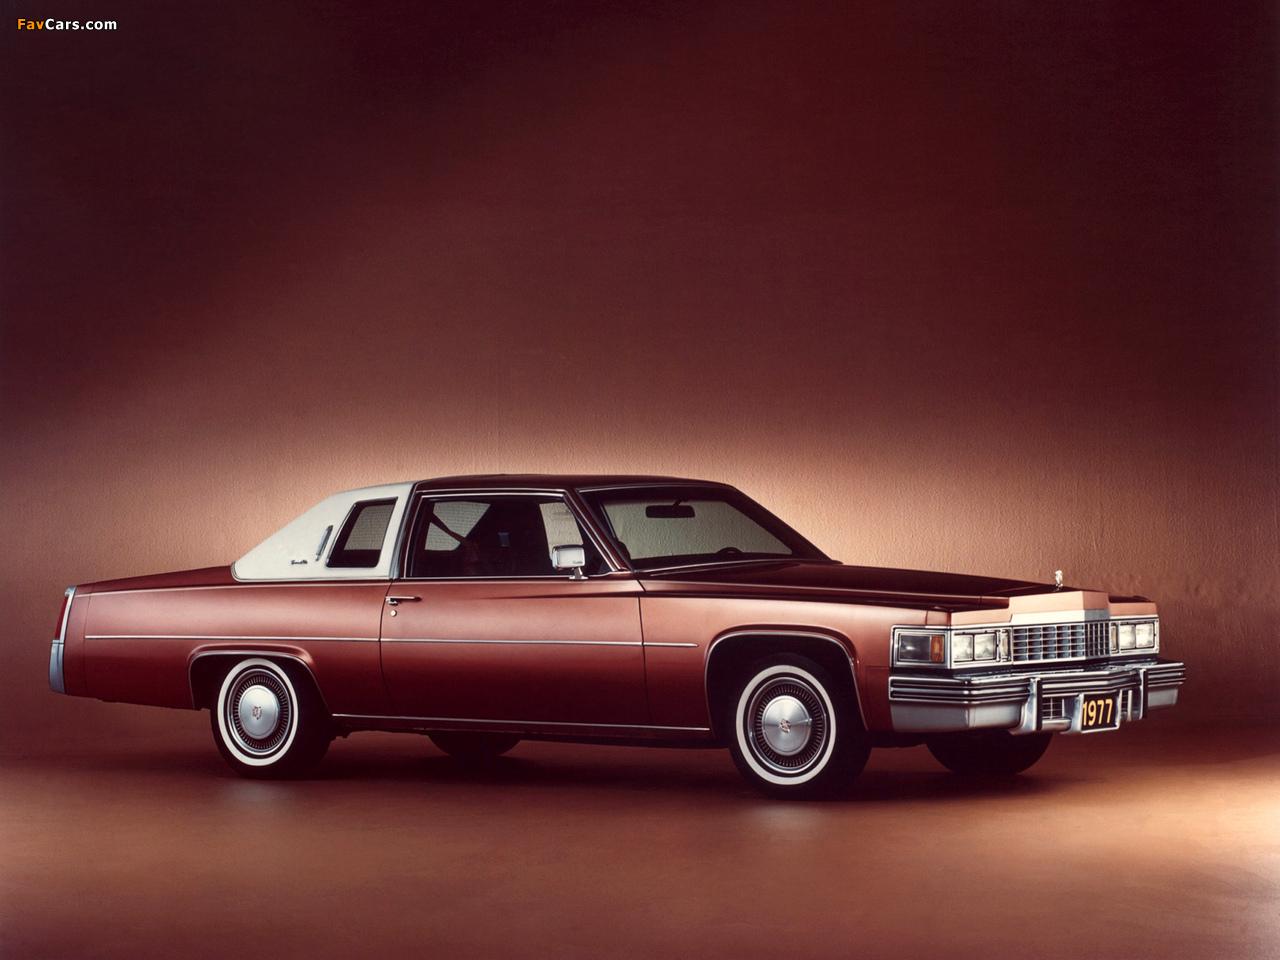 Pictures of Cadillac Coupe de Ville 1977 (1280 x 960)